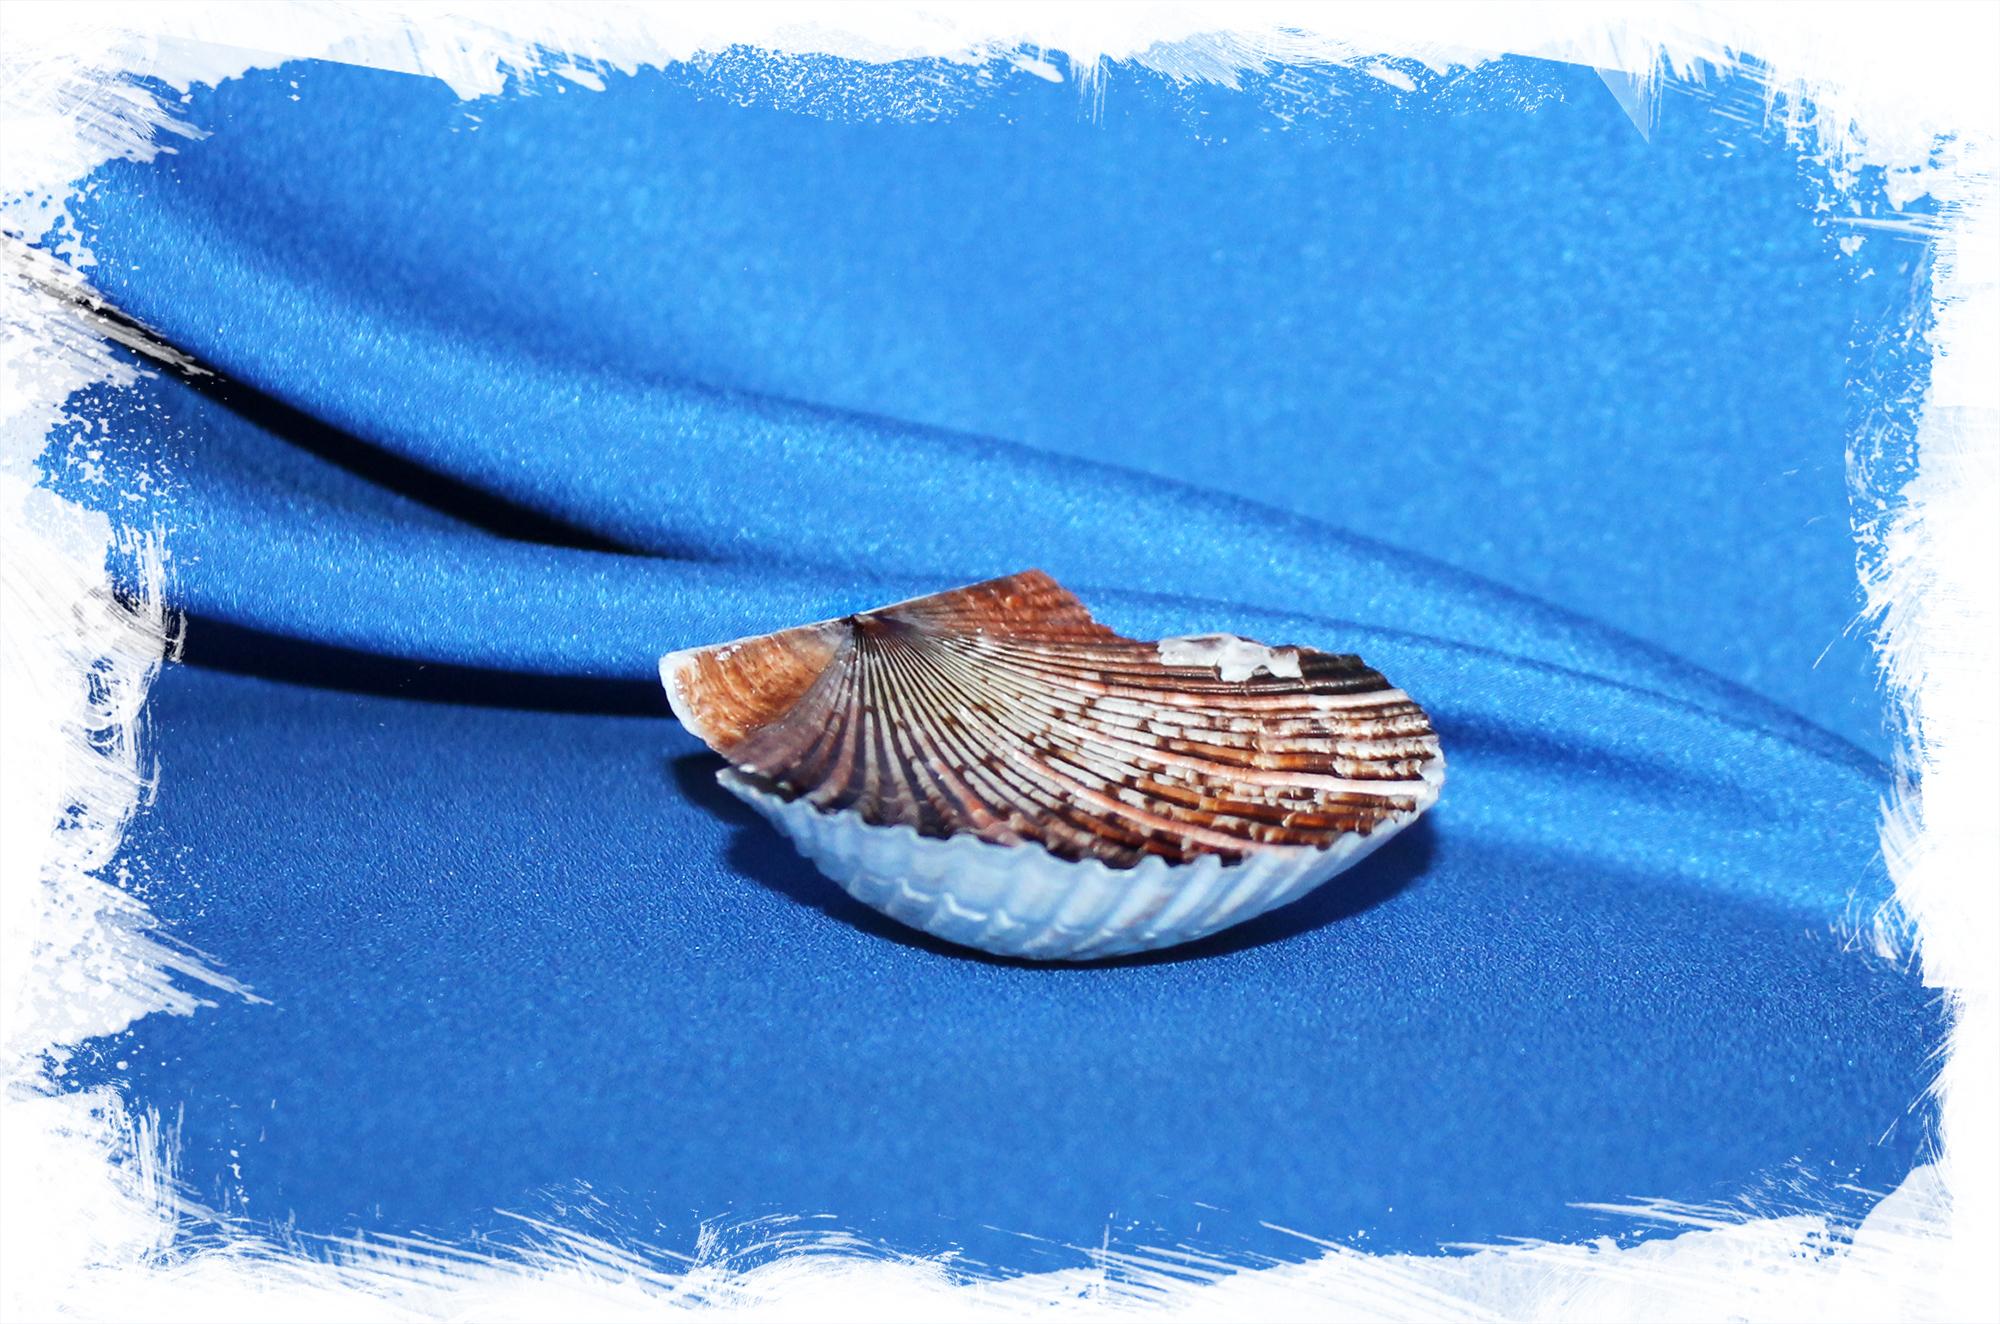 Морской гребешок Пуксидатус, Minnivola pyxidata